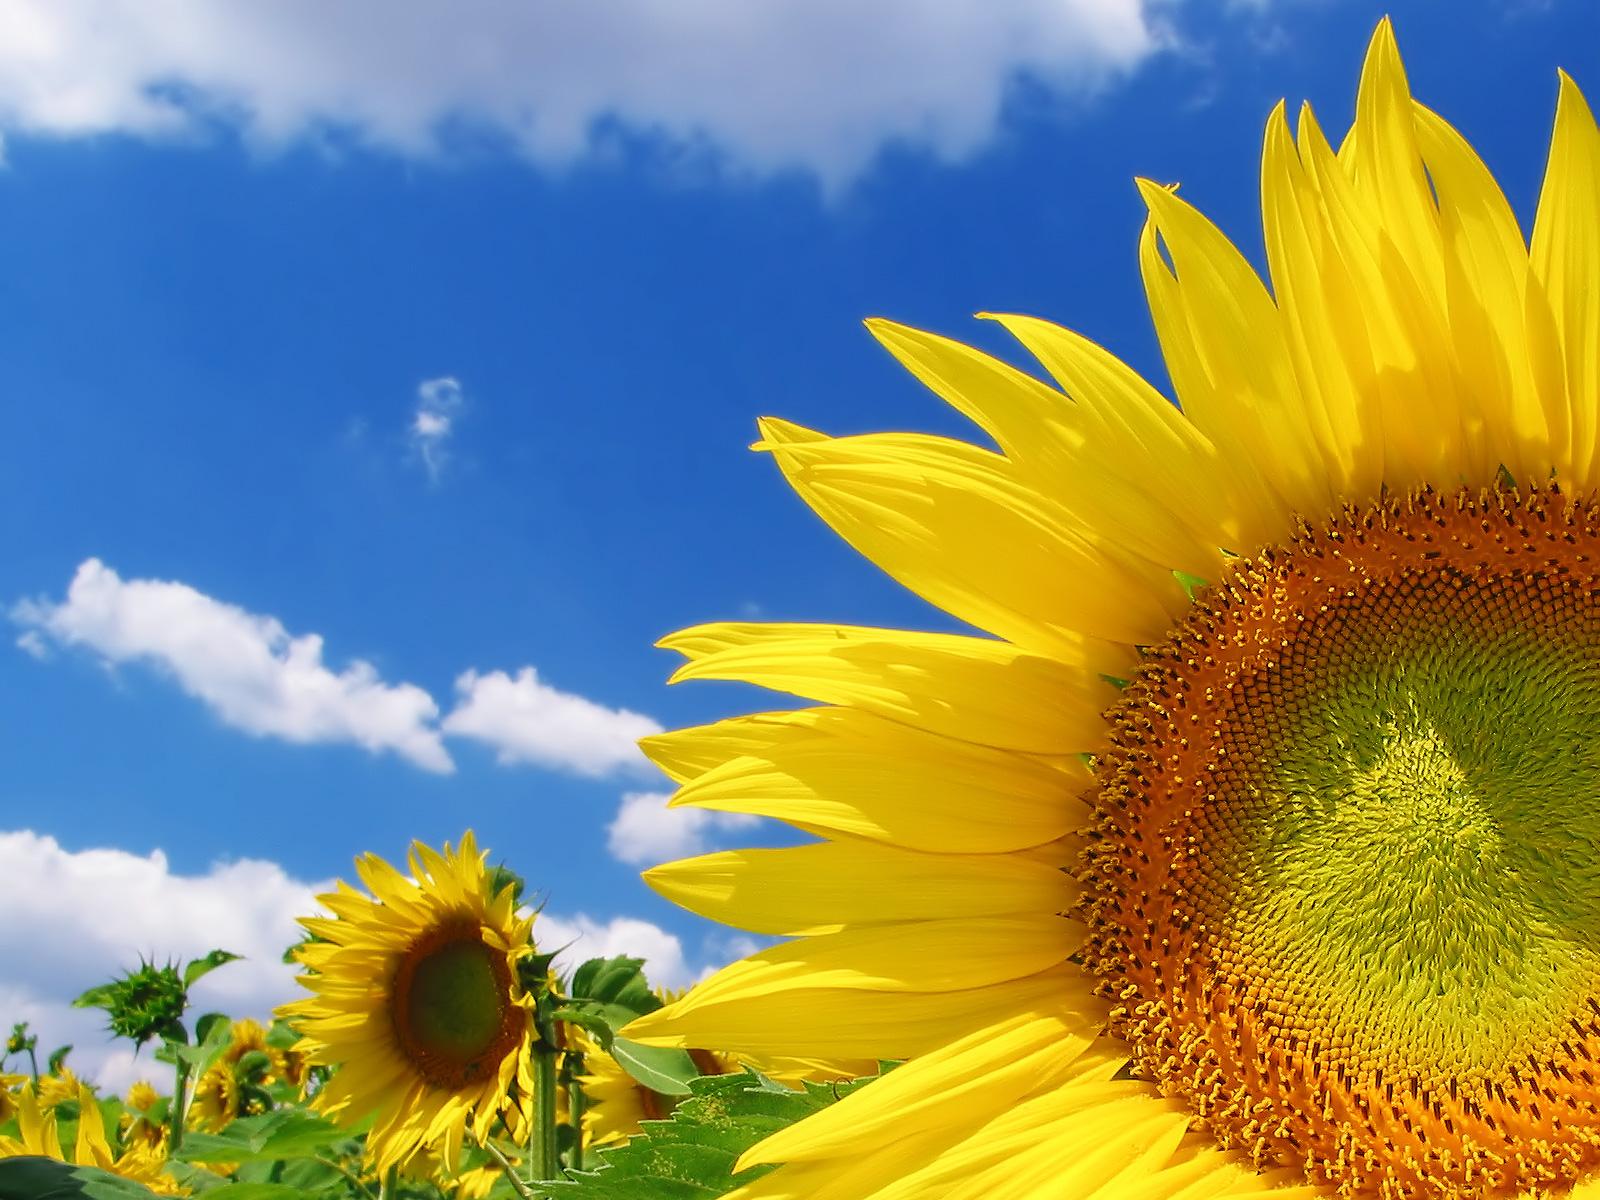 http://2.bp.blogspot.com/-DDz3XA8aXVc/Thl7f6w81yI/AAAAAAAAAi0/a77d4RBo5F4/s1600/1303953220_1600x1200_sunflower-hd-wallpaper.jpg